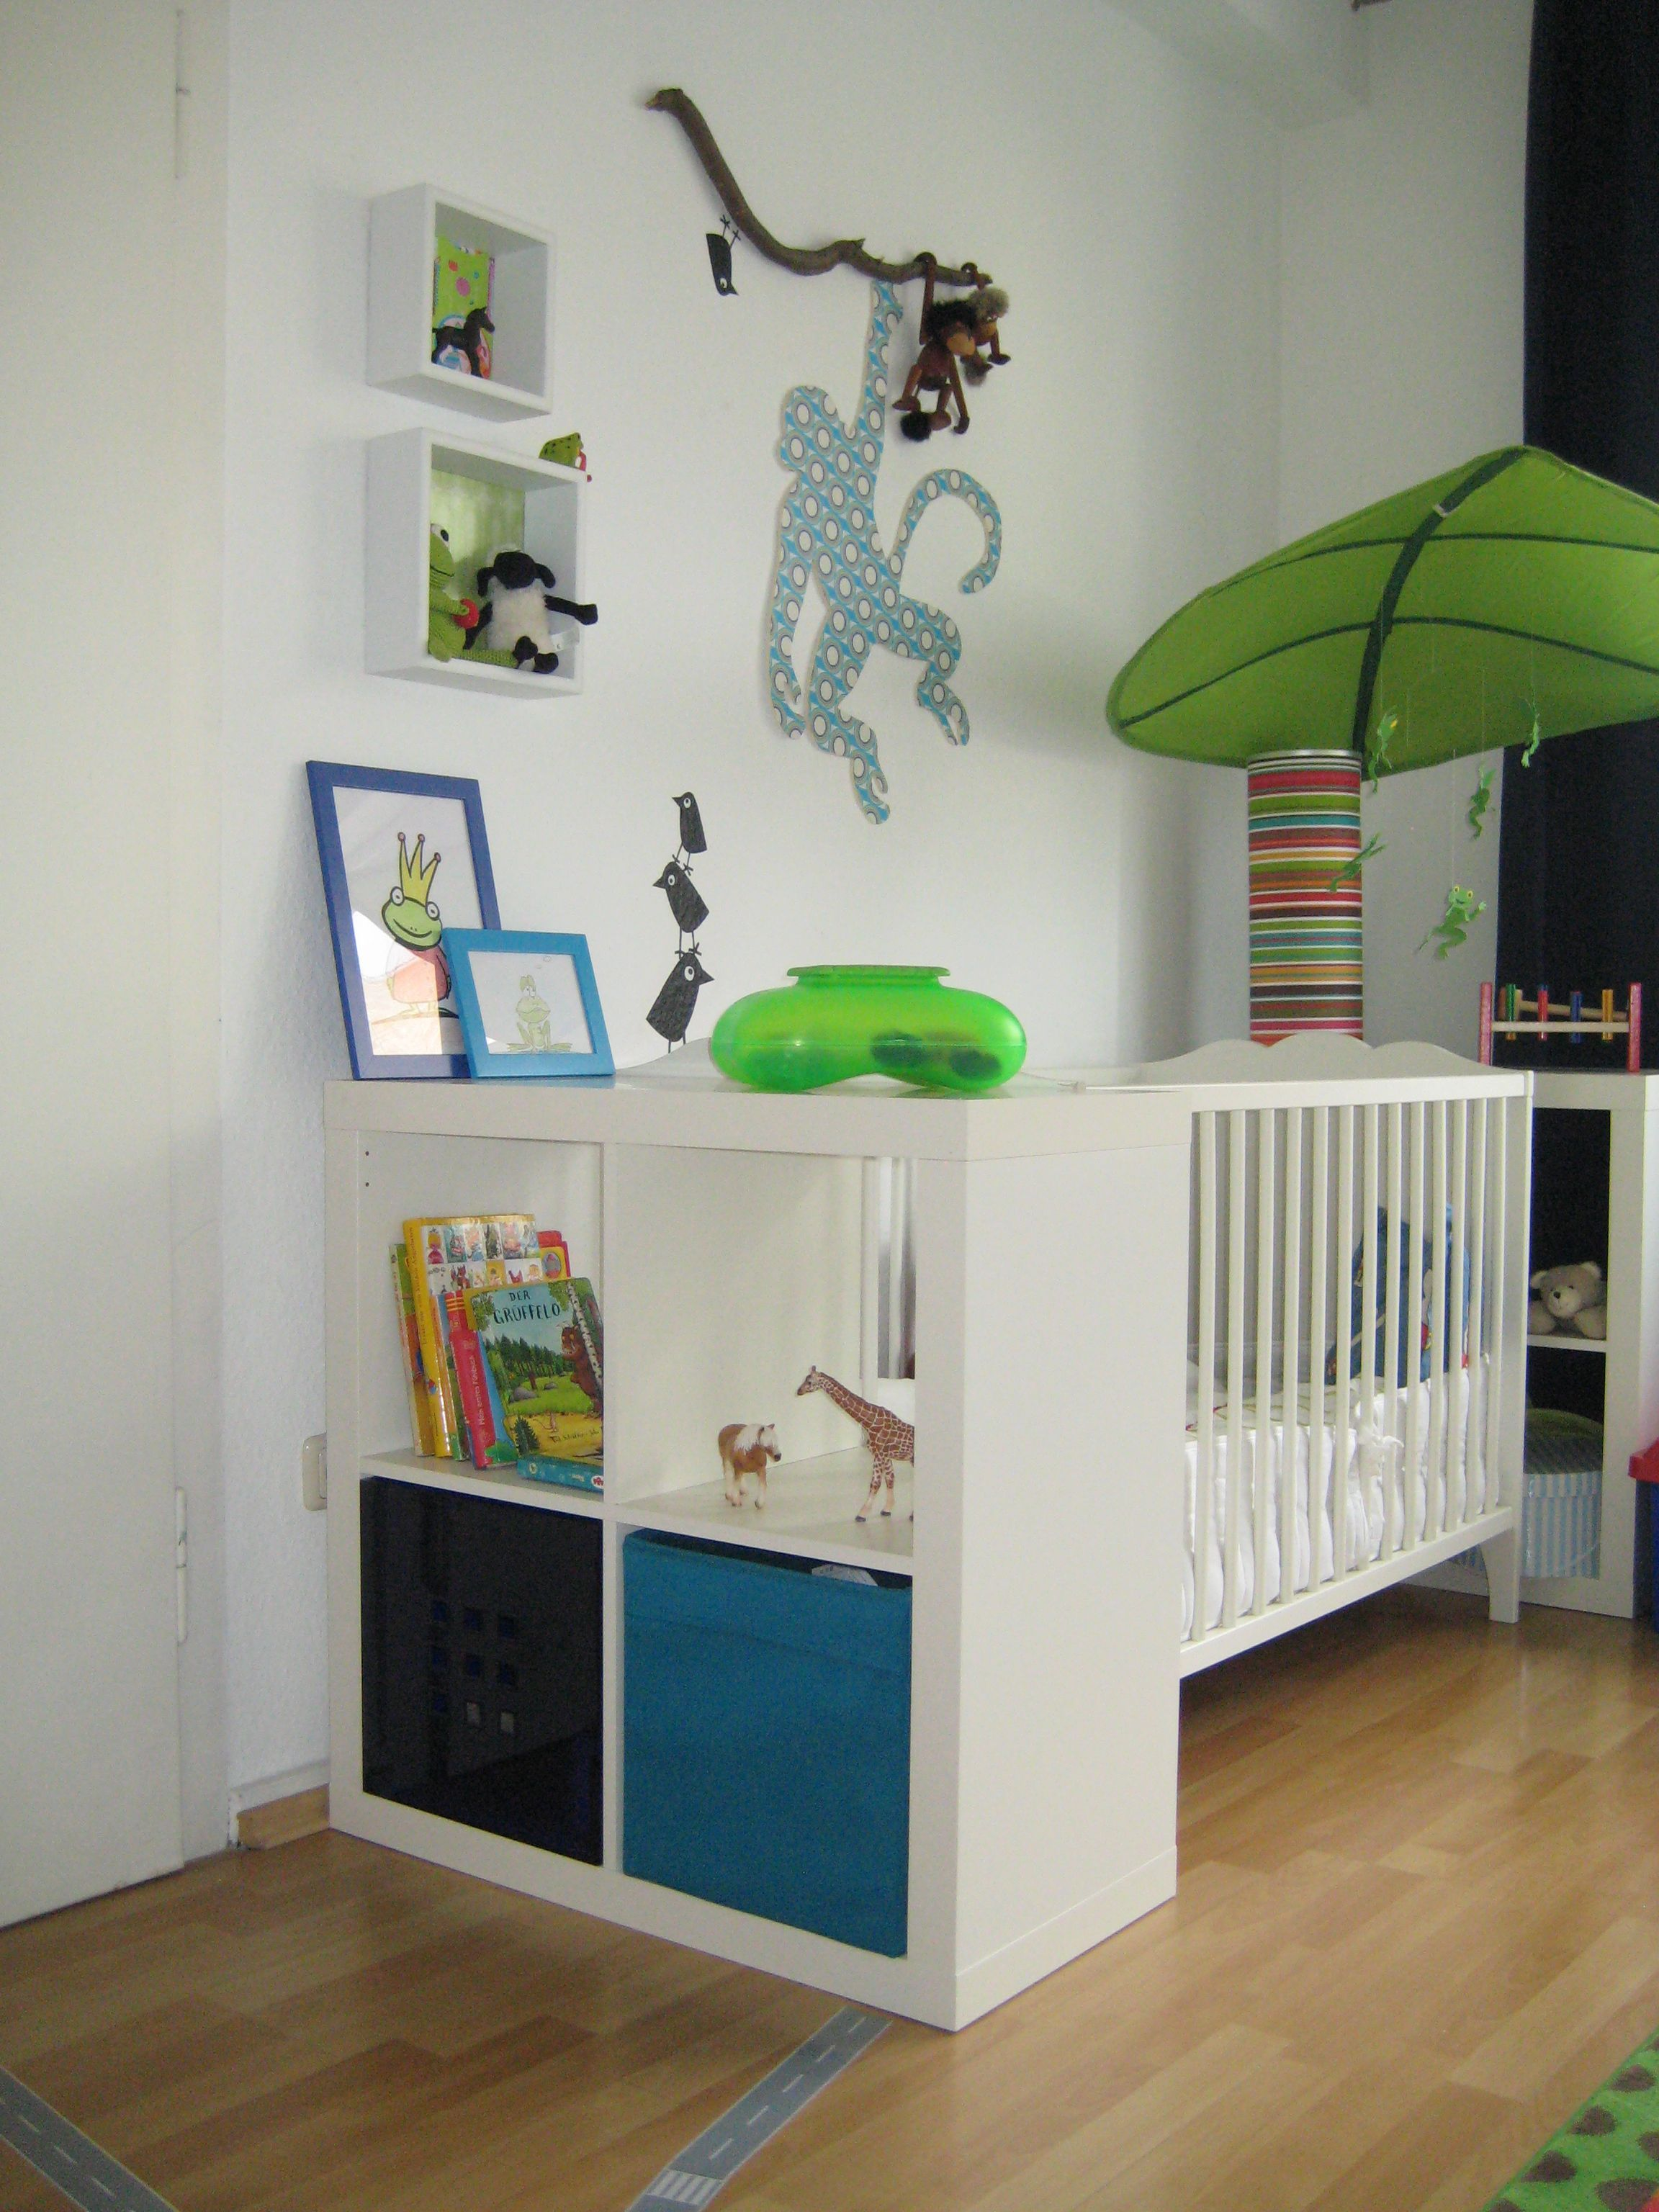 Kinderzimmer Kinder zimmer, Kinderzimmer und Raumteiler